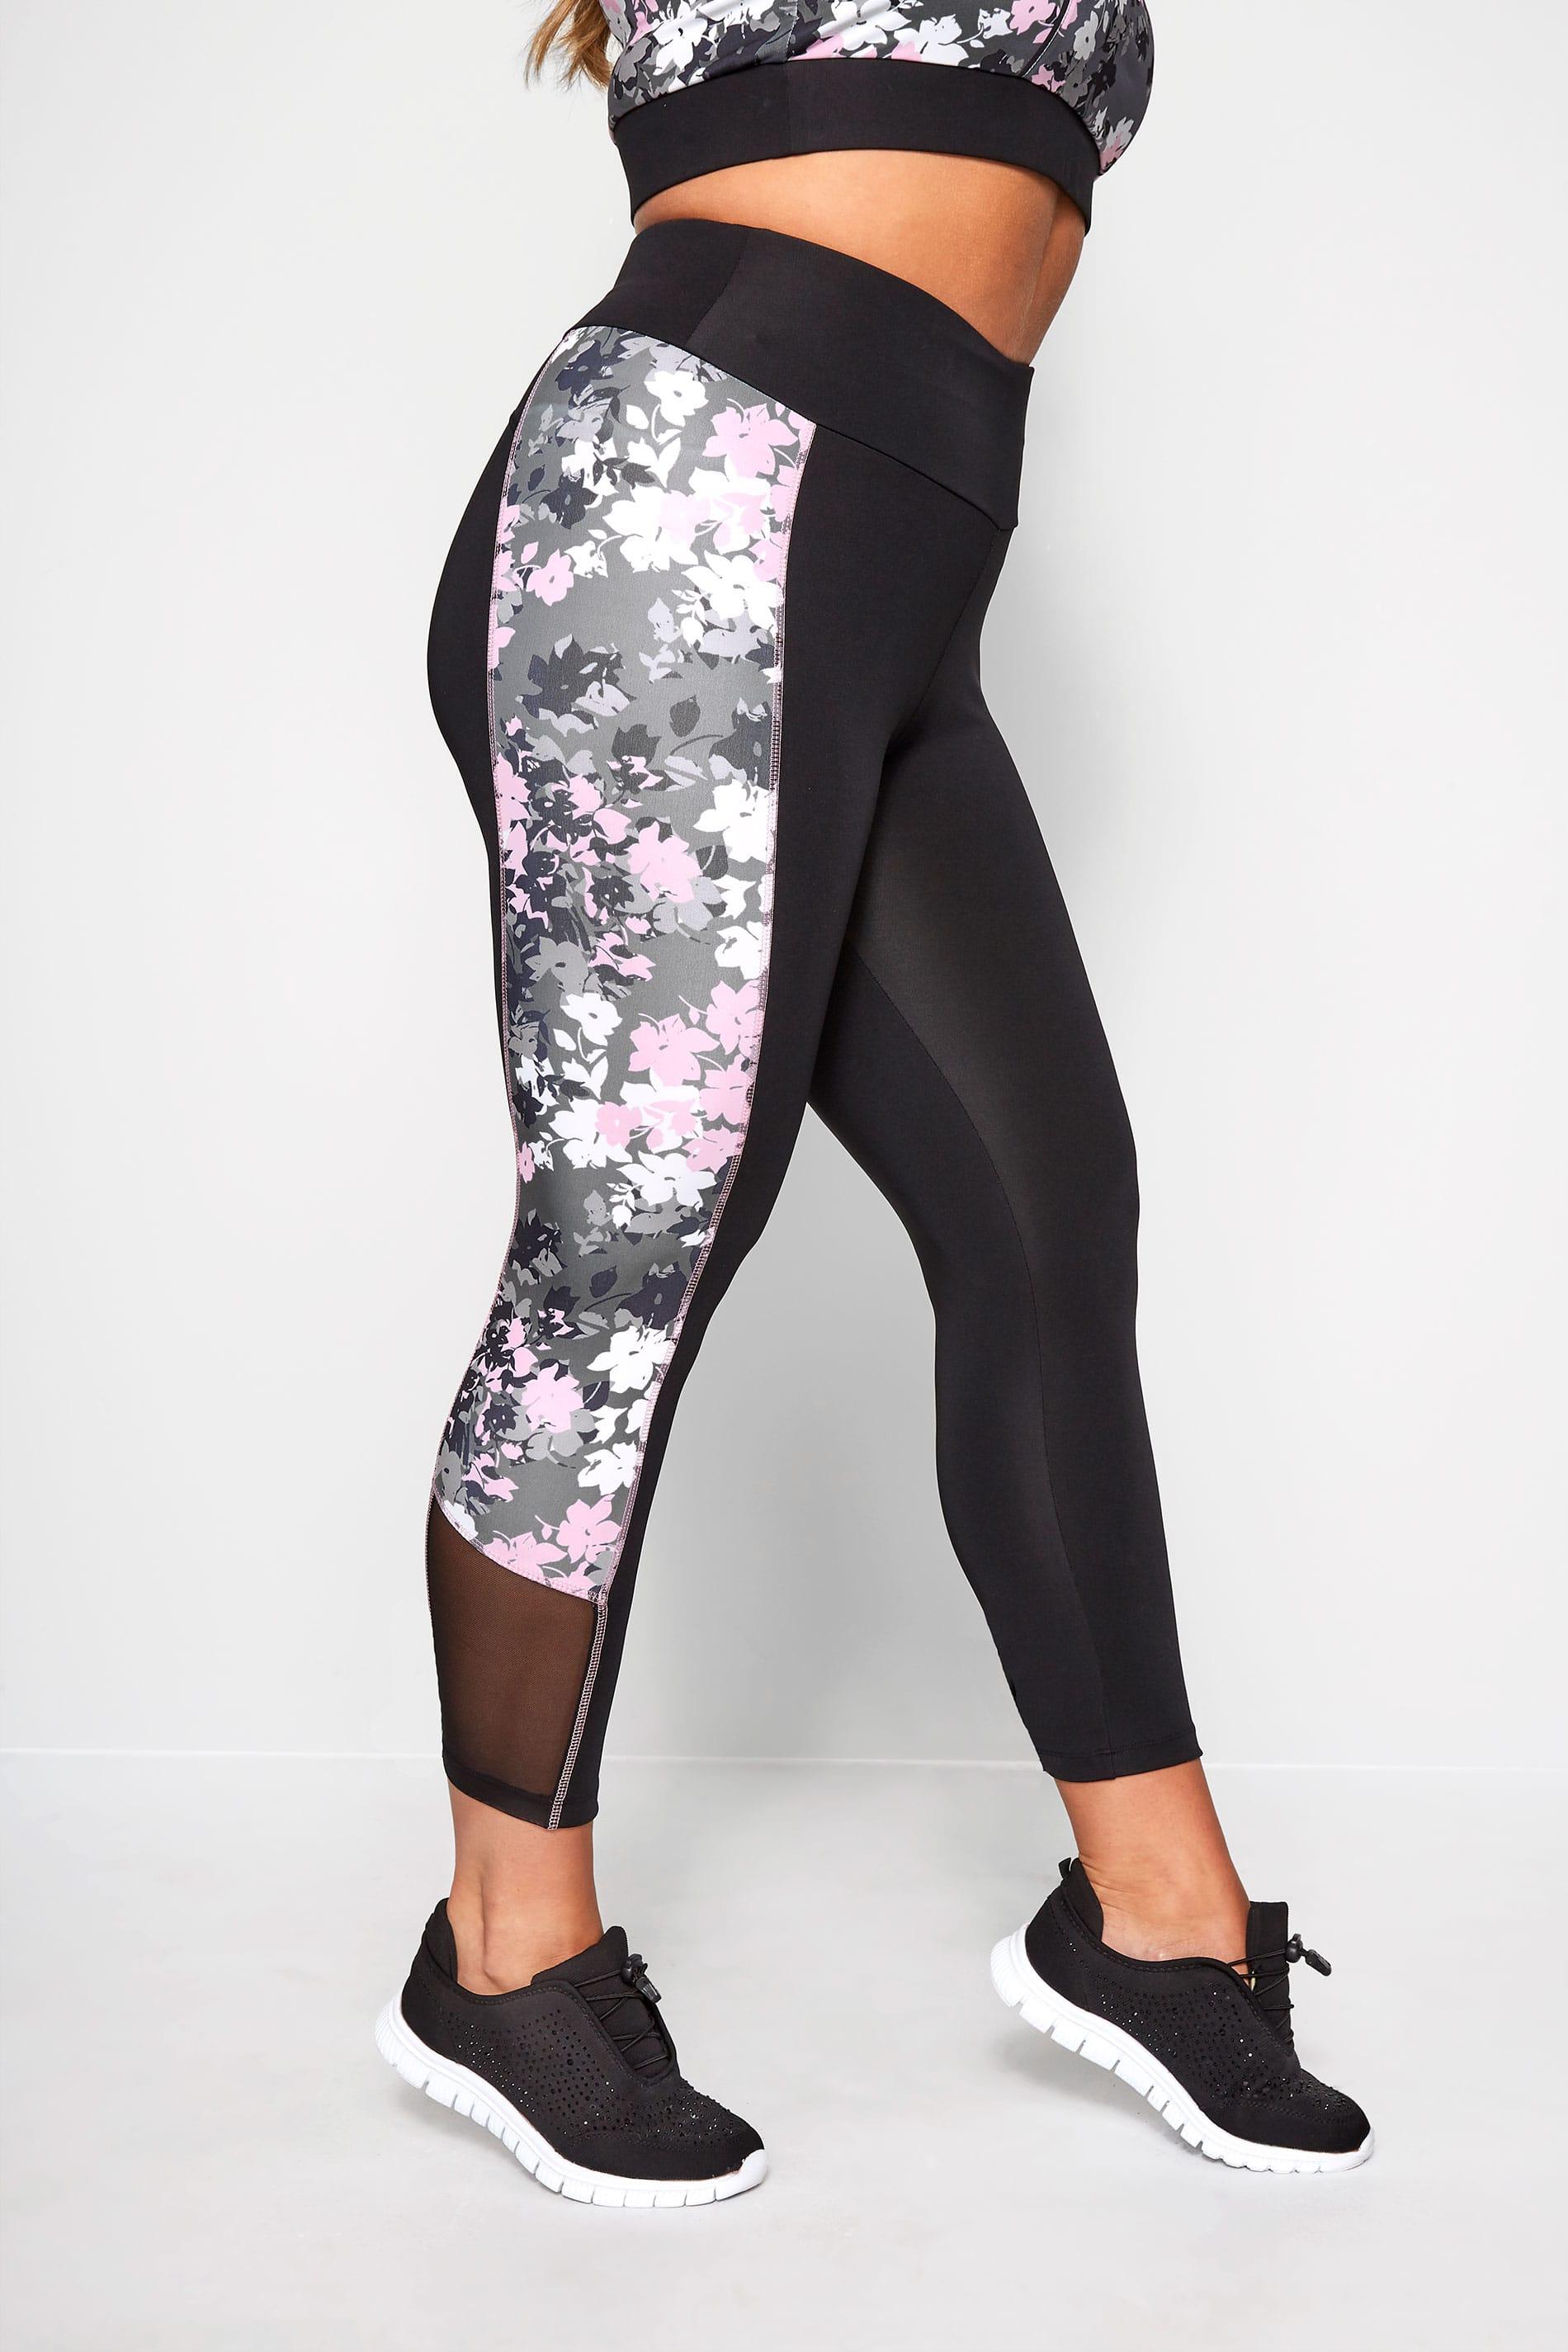 ACTIVE Black Floral Performance Leggings